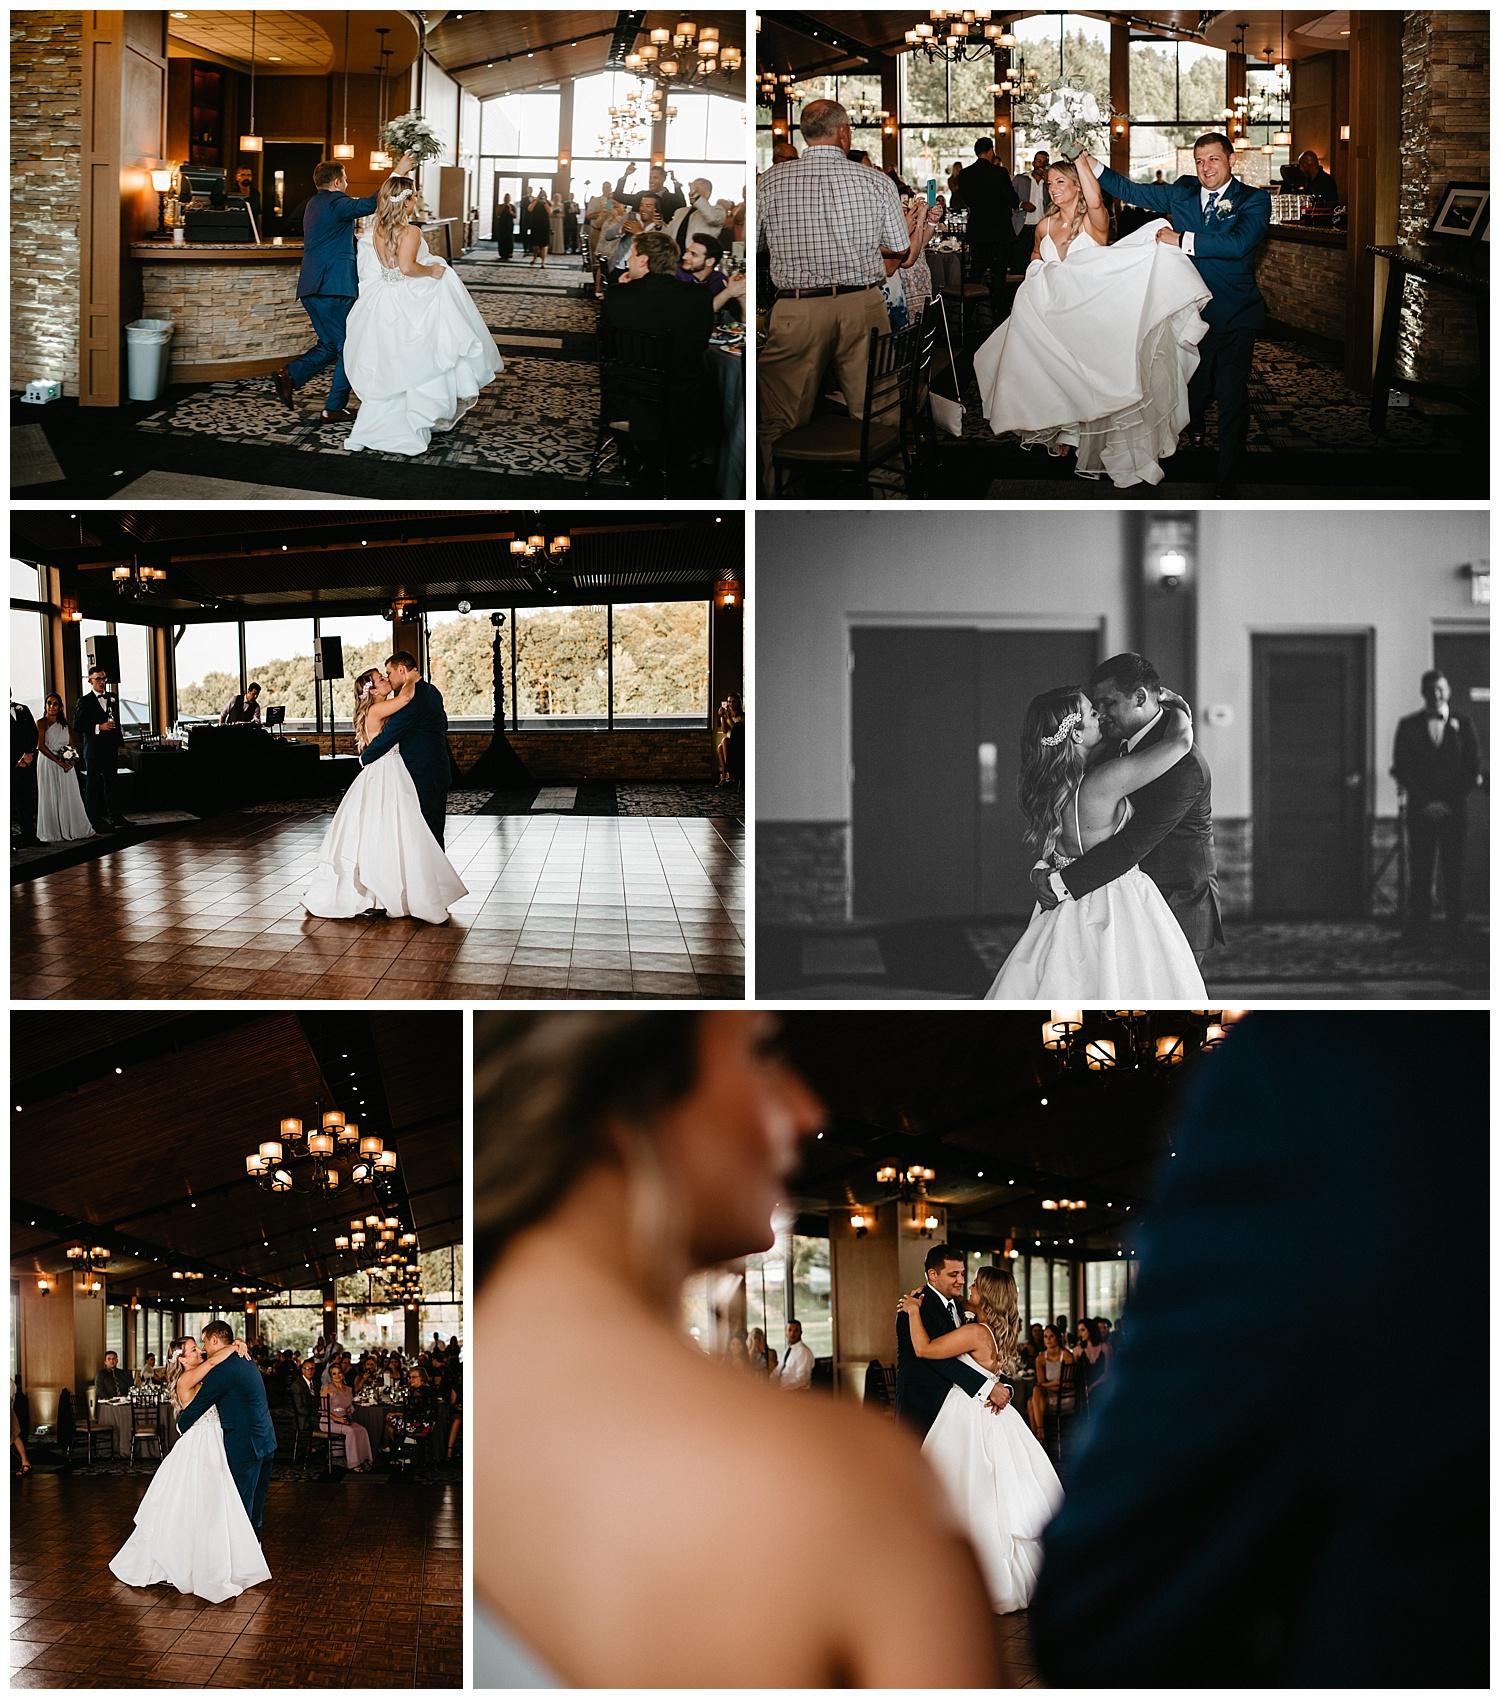 Destination-Wedding-Photographer-in-NEPA-Palmerton-PA_0029.jpg